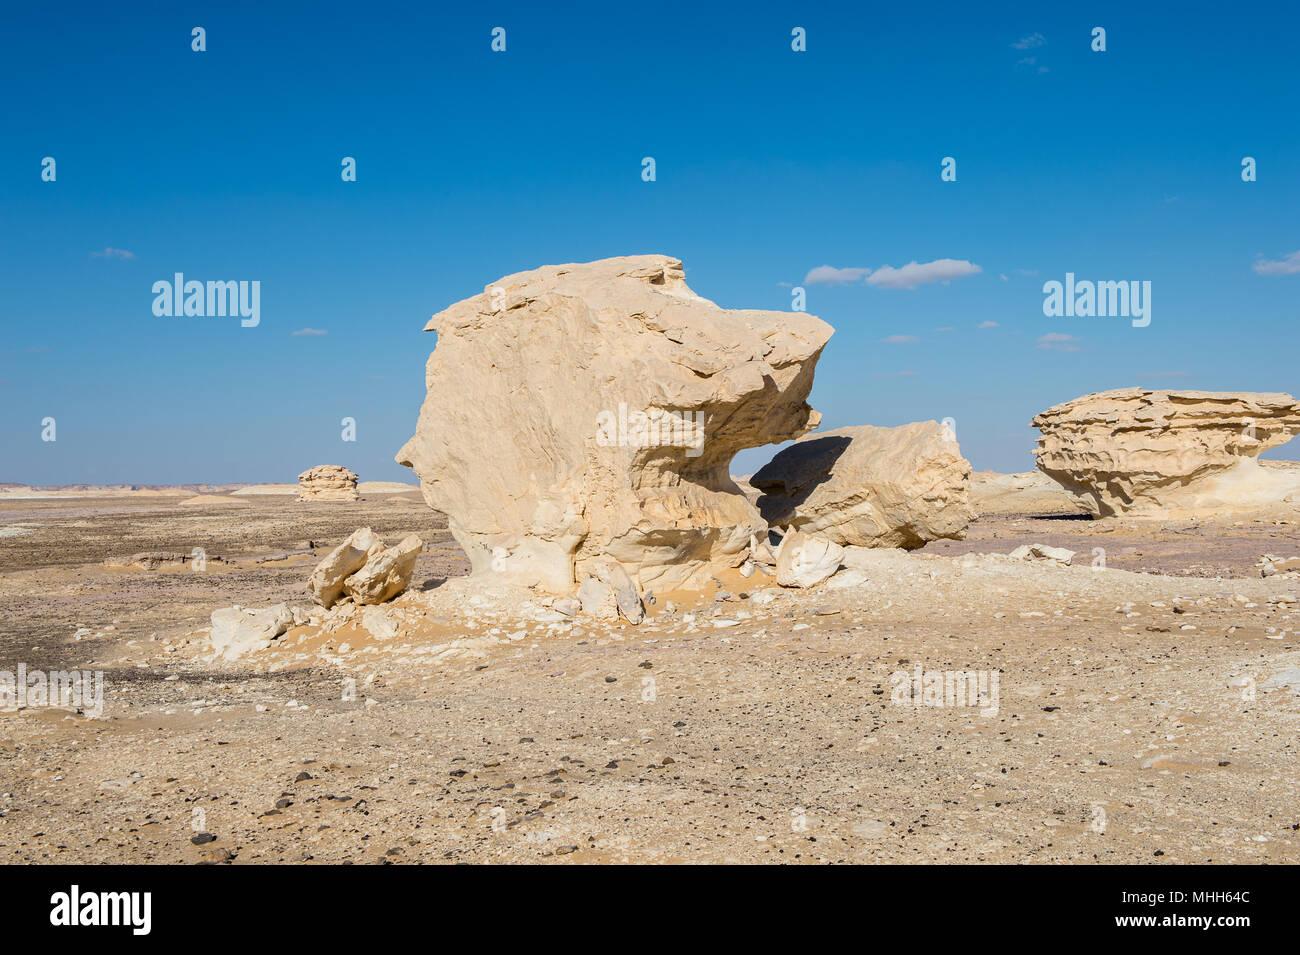 Mushroom rock formations at the Western White Desert of Egypt - Stock Image